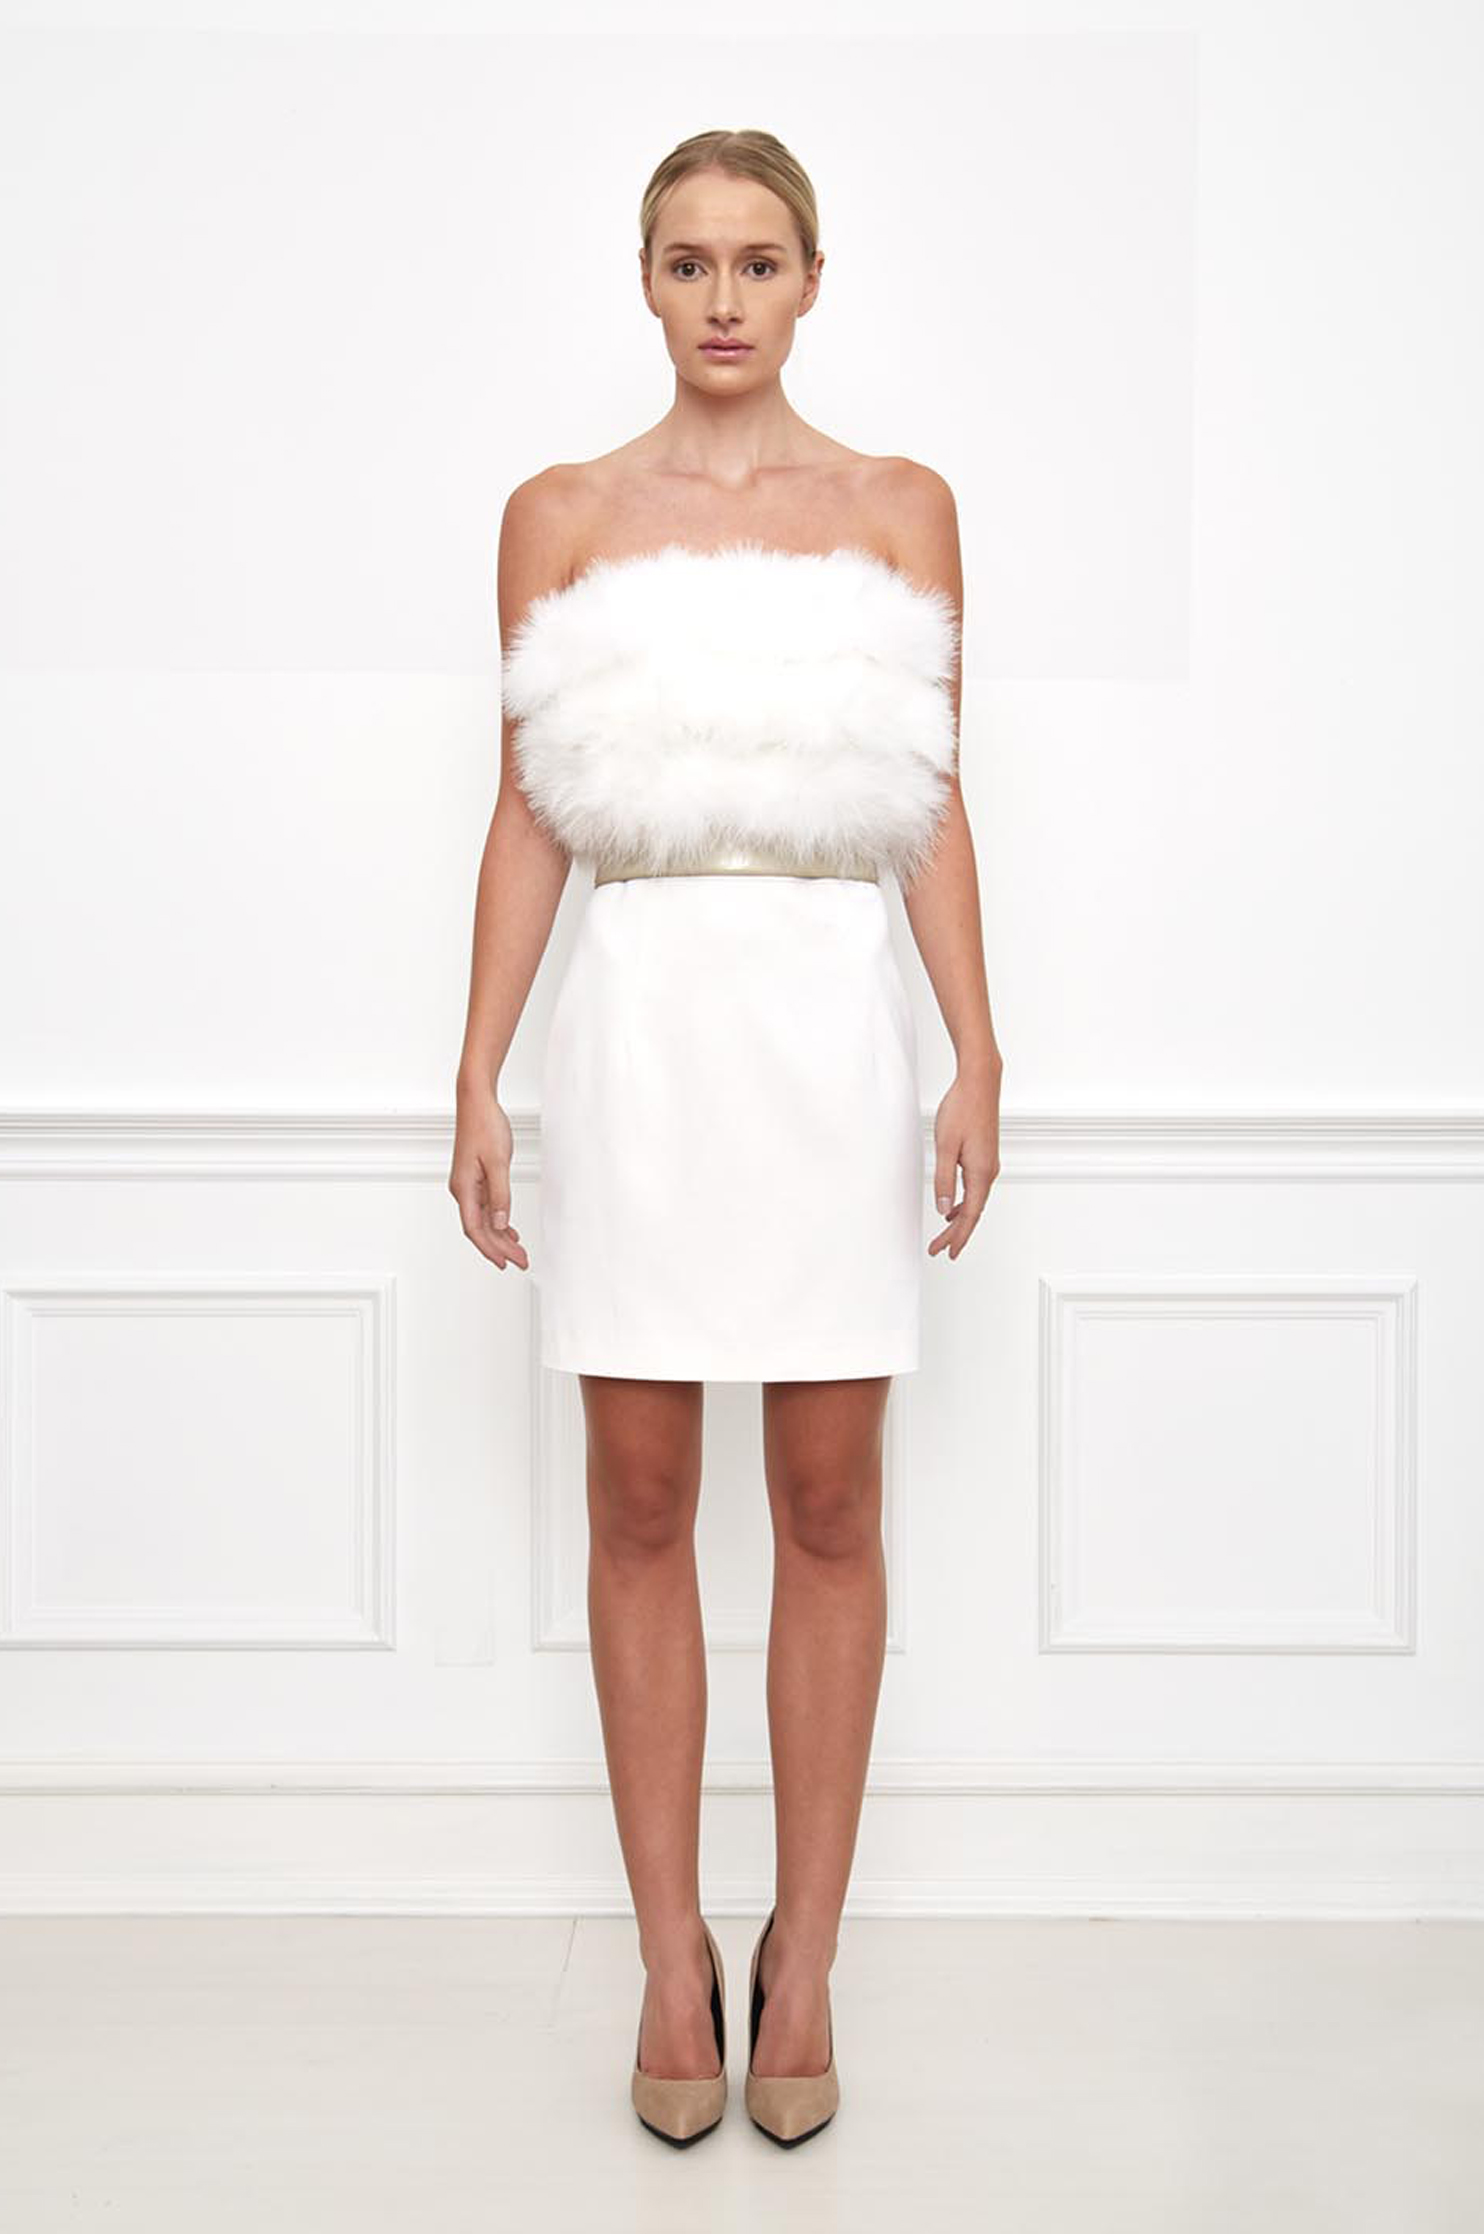 dress_MAXINE_wht_01